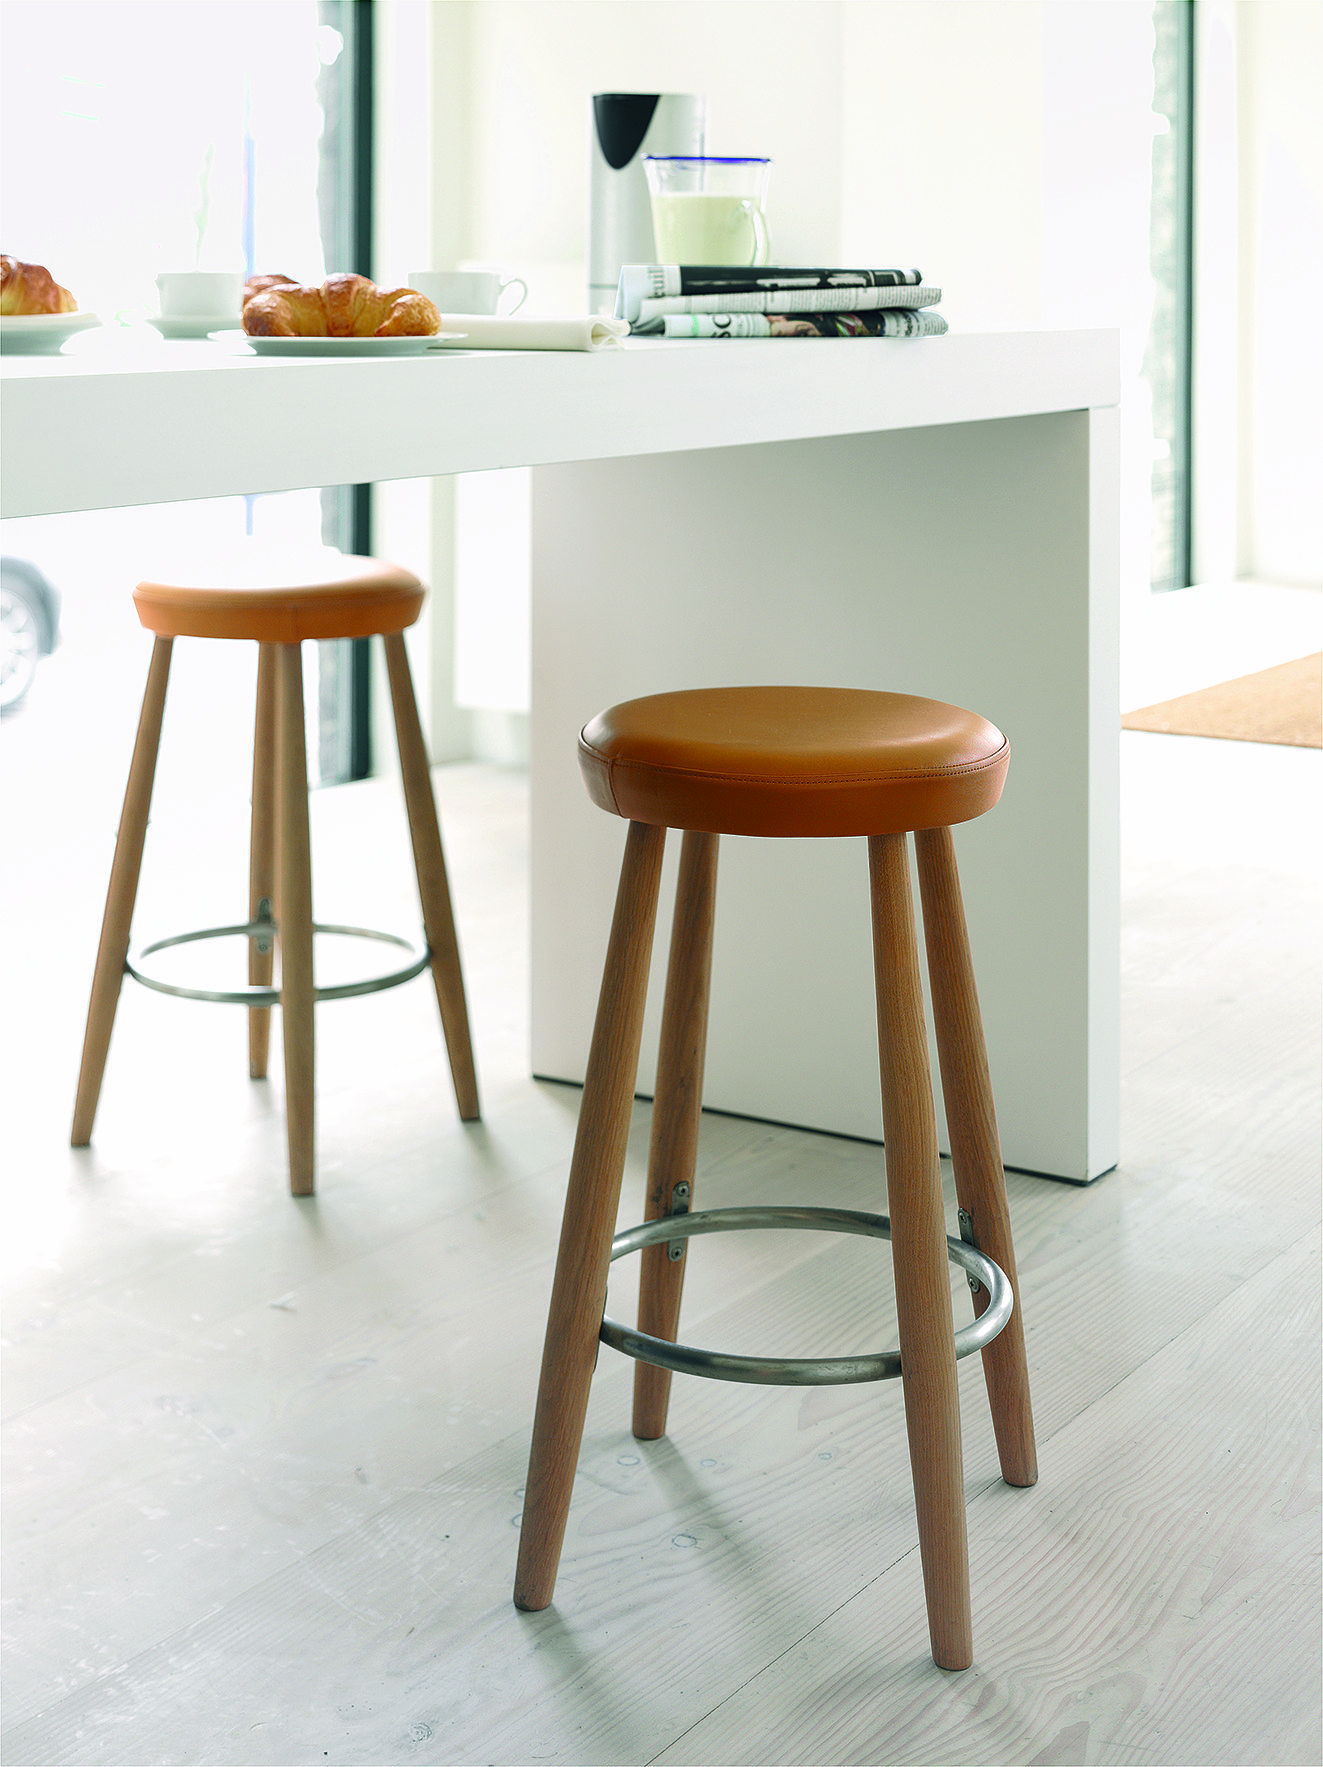 Hans Wegner CH58 classic upholstered bar stool | bulthaup melbourne ...